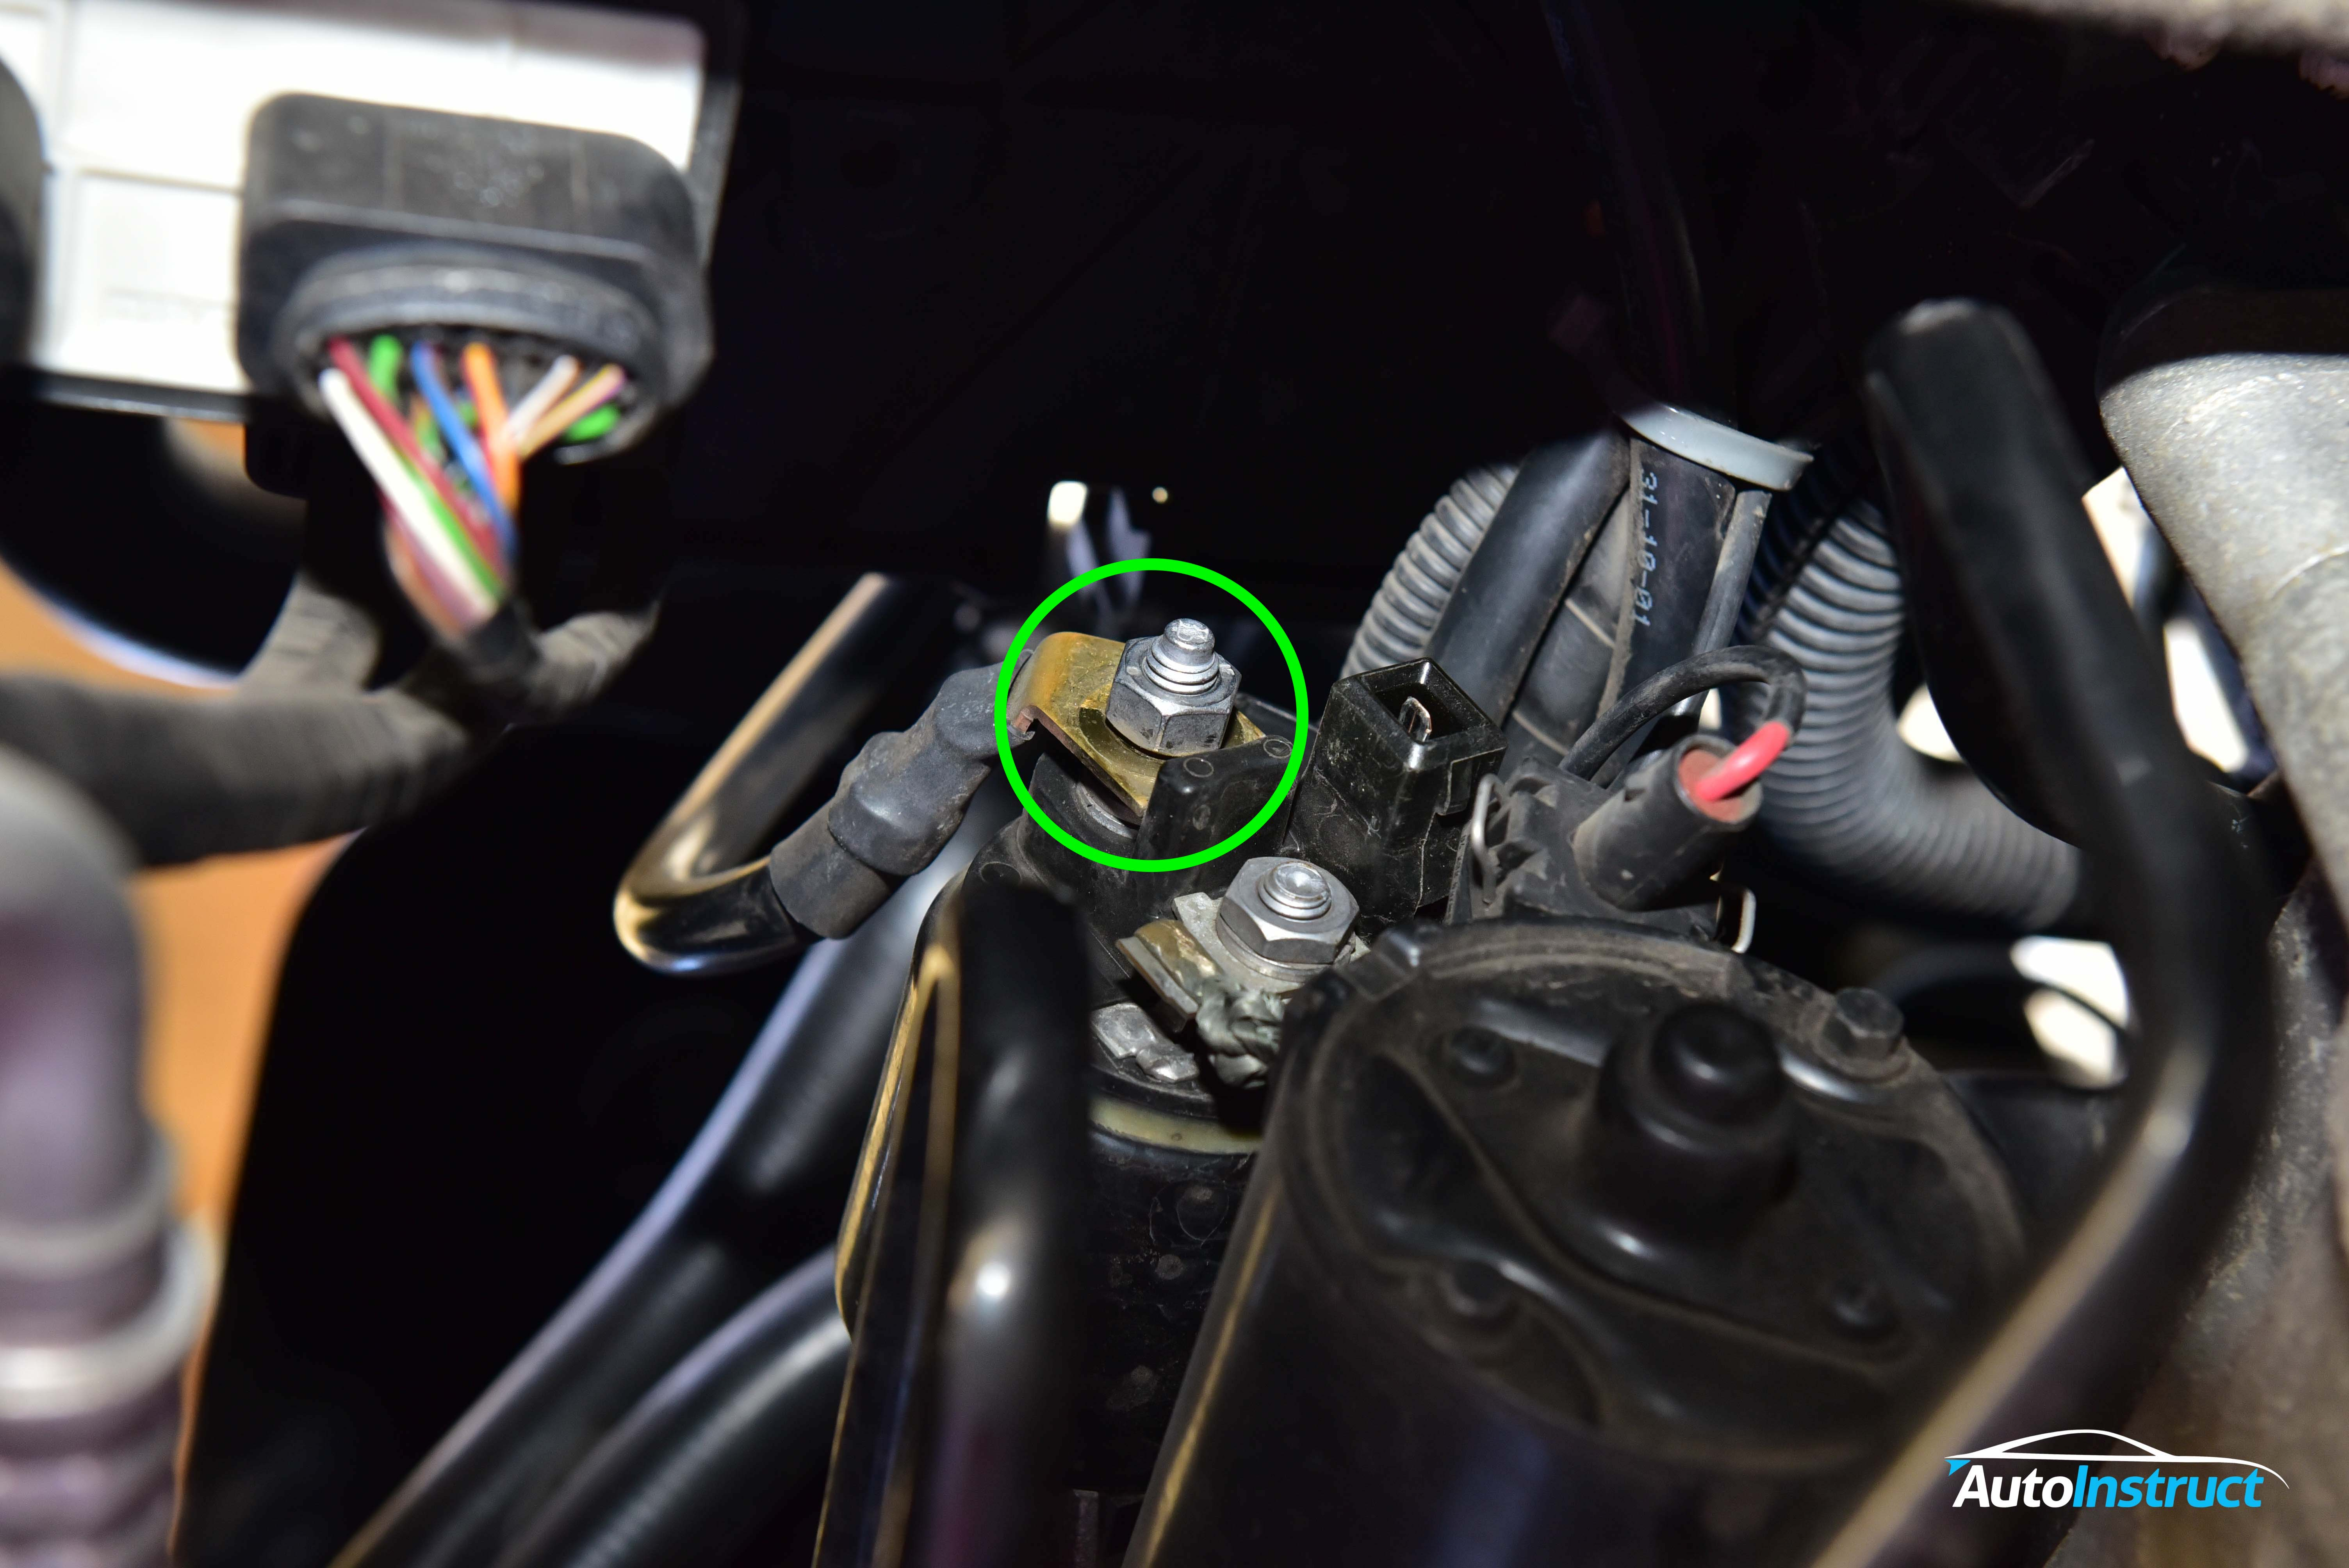 MK4 Golf 2.0L Starter Motor Replacement